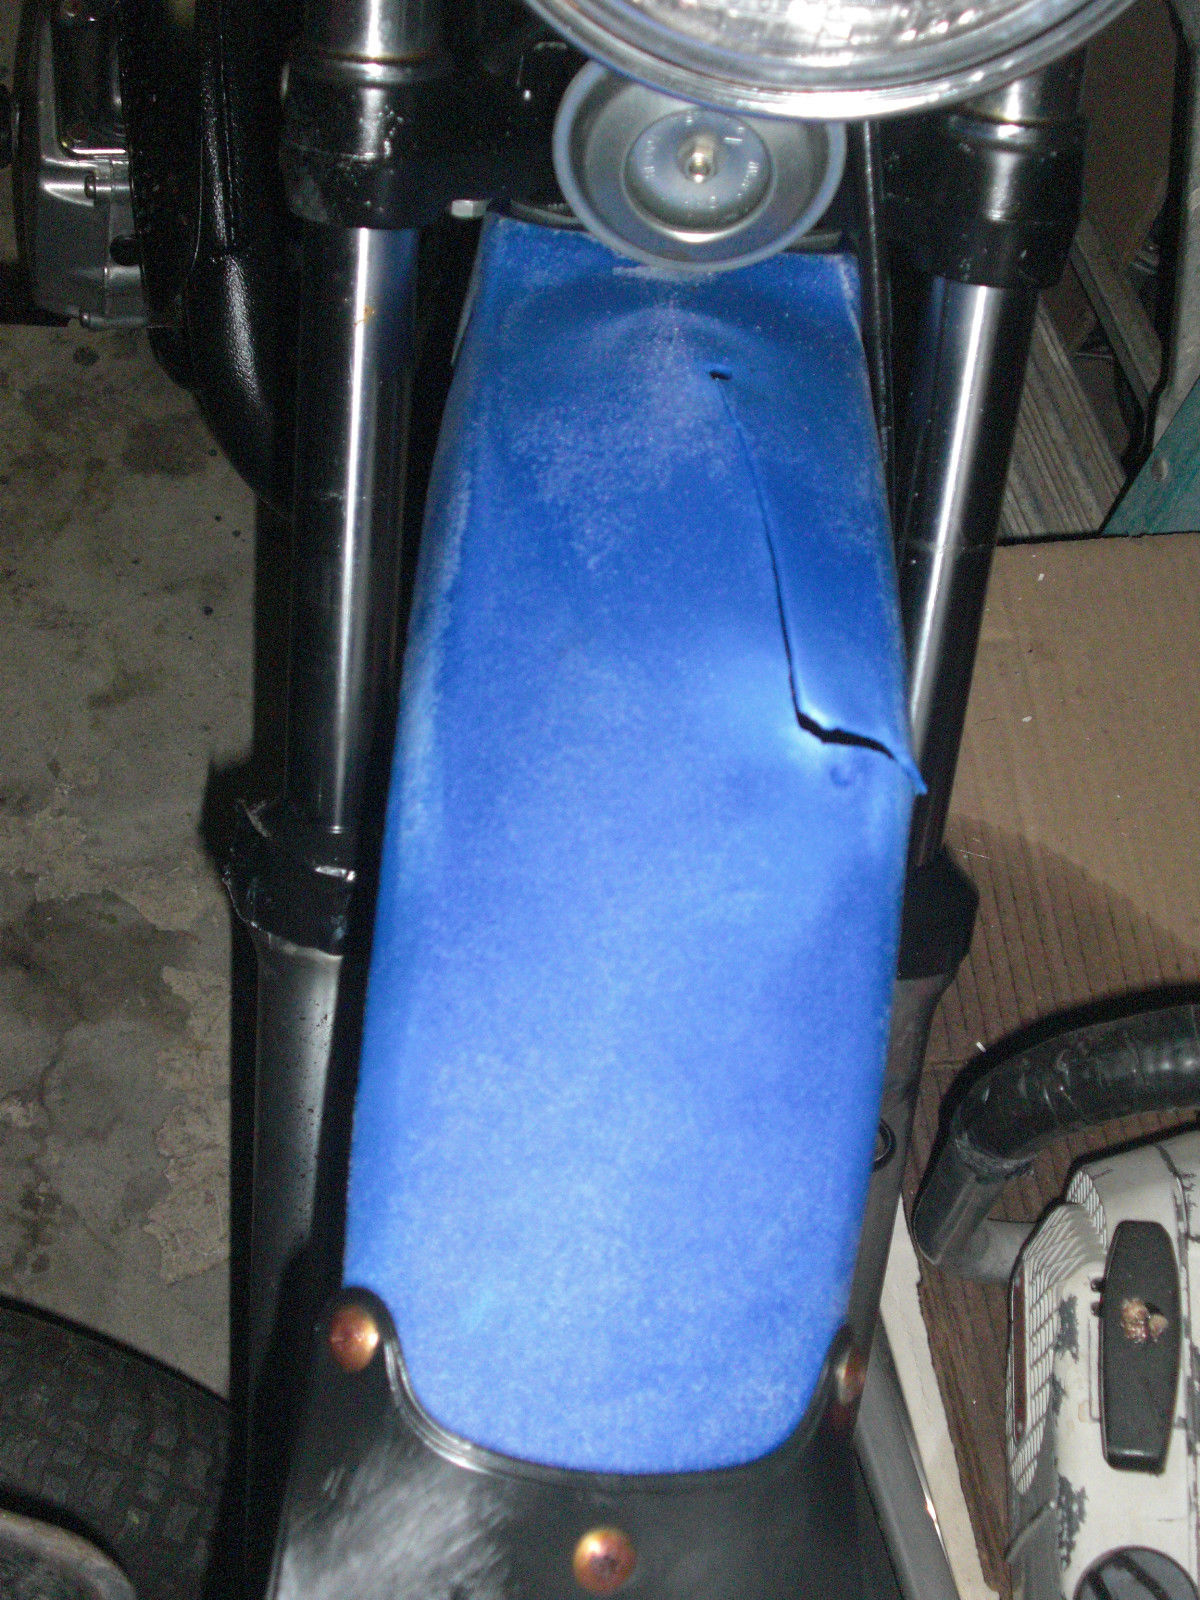 Vintage 1979 Blue Kawasaki Ke 125 Motorcycle Enduro Motor Bike Runs